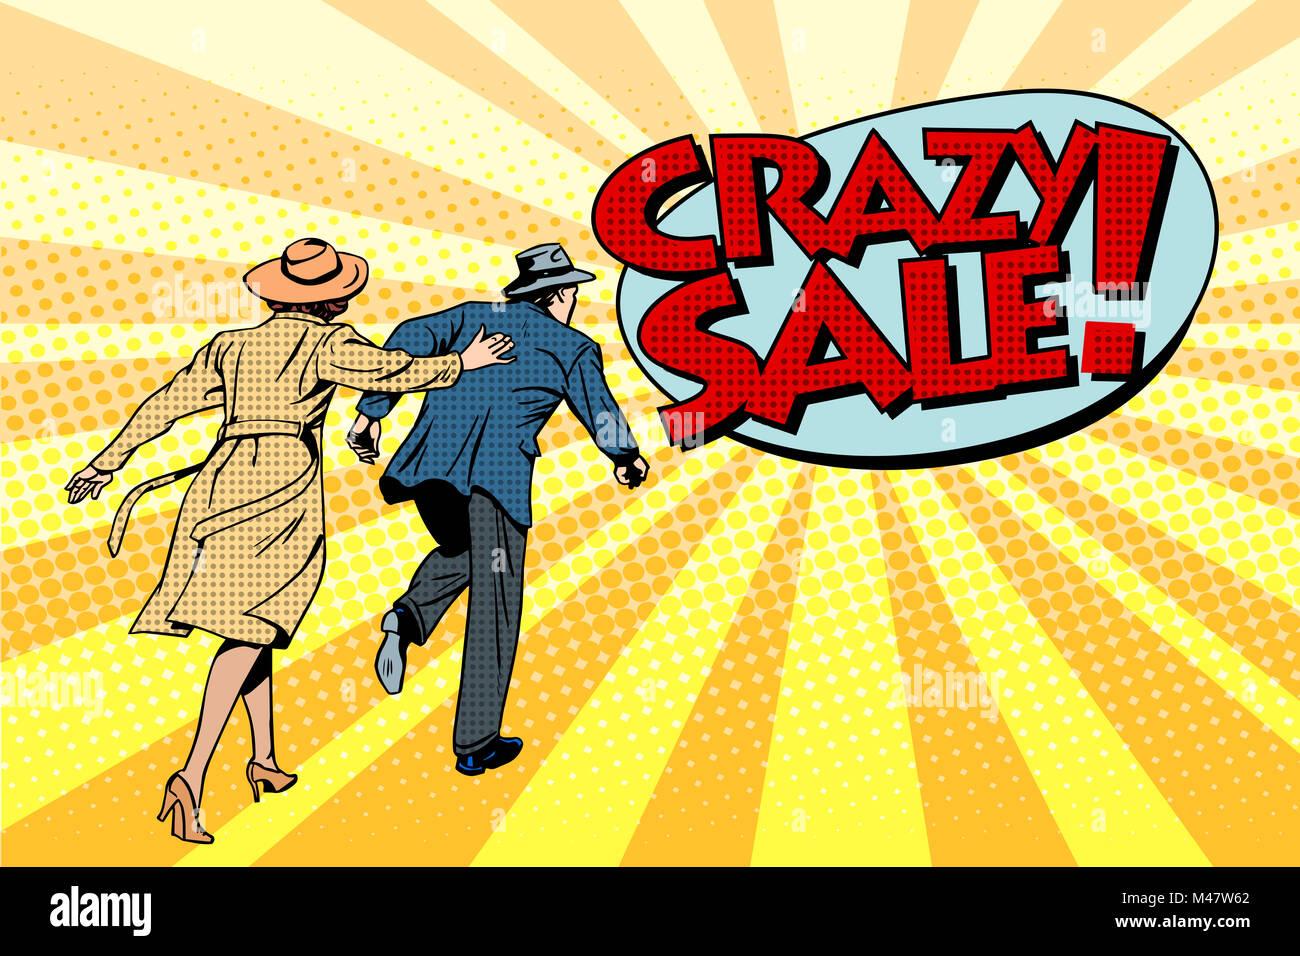 Super Crazy vente Promotions Photo Stock